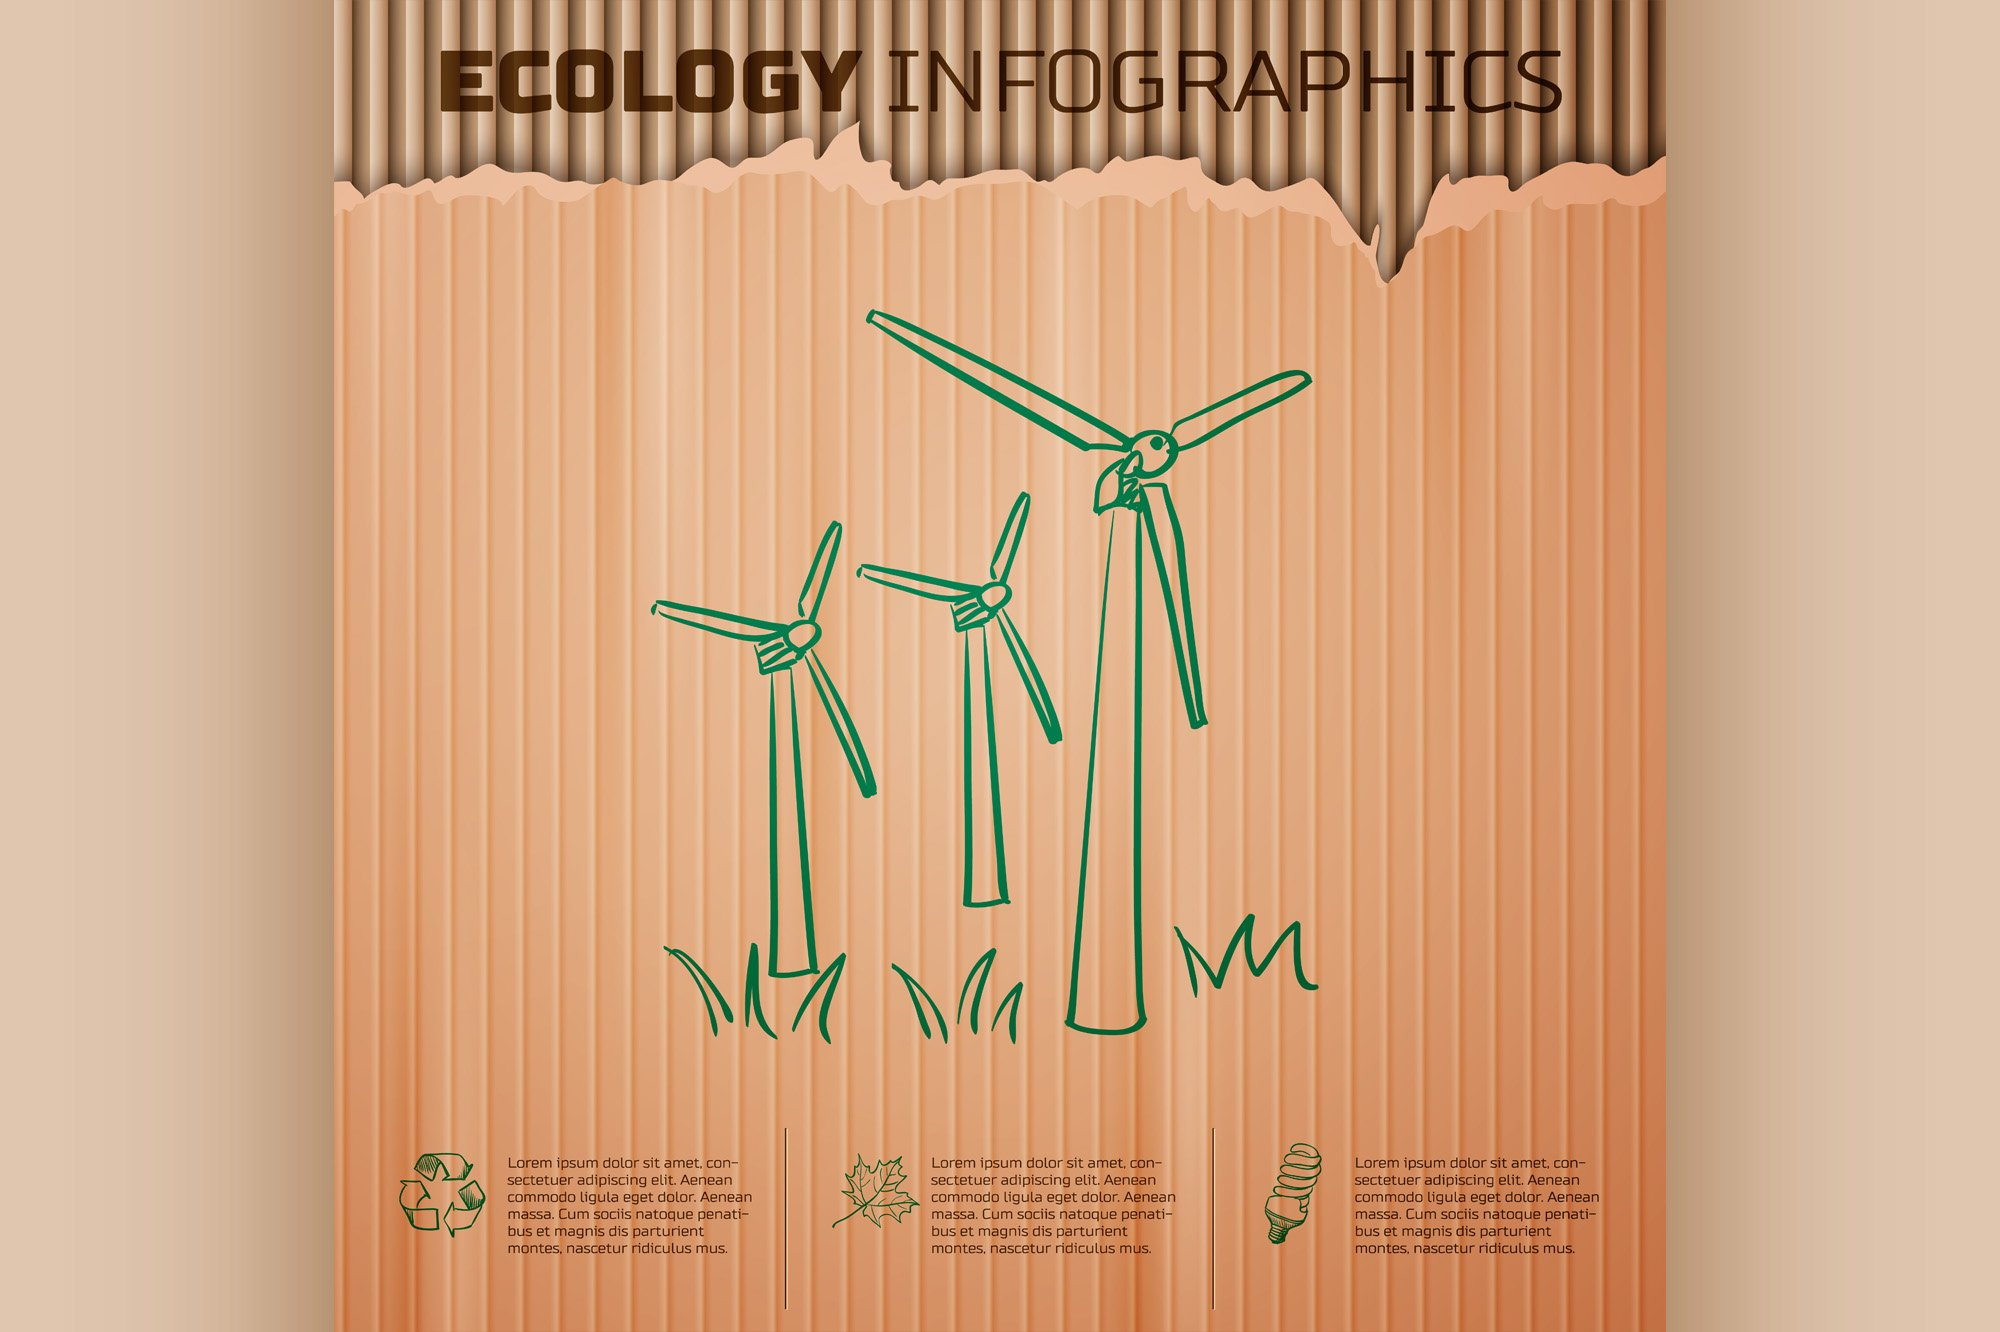 Ecology infographics background example image 1